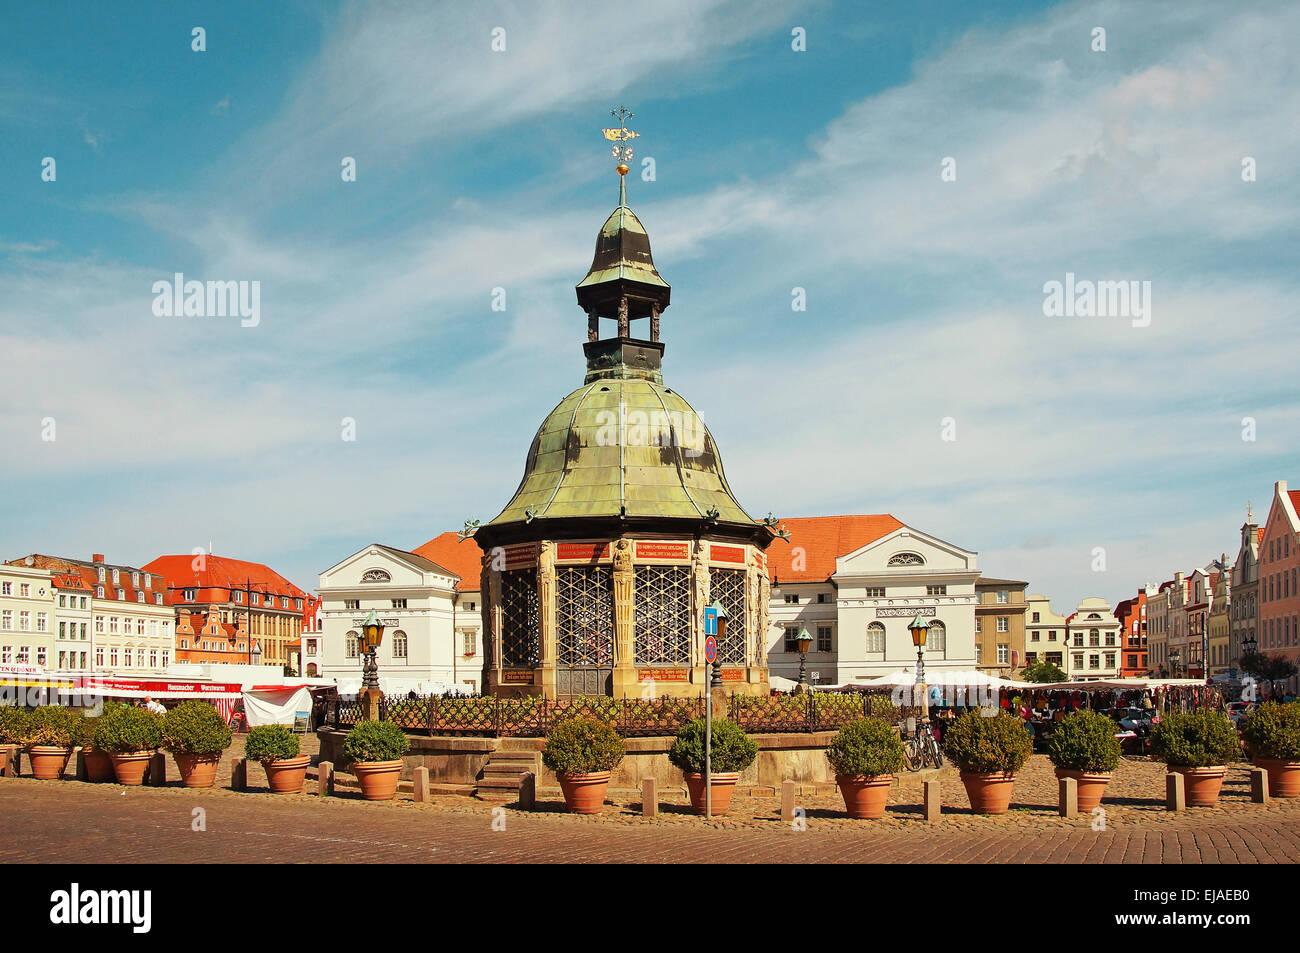 Market Place Hanseatic City Wismar Germany - Stock Image